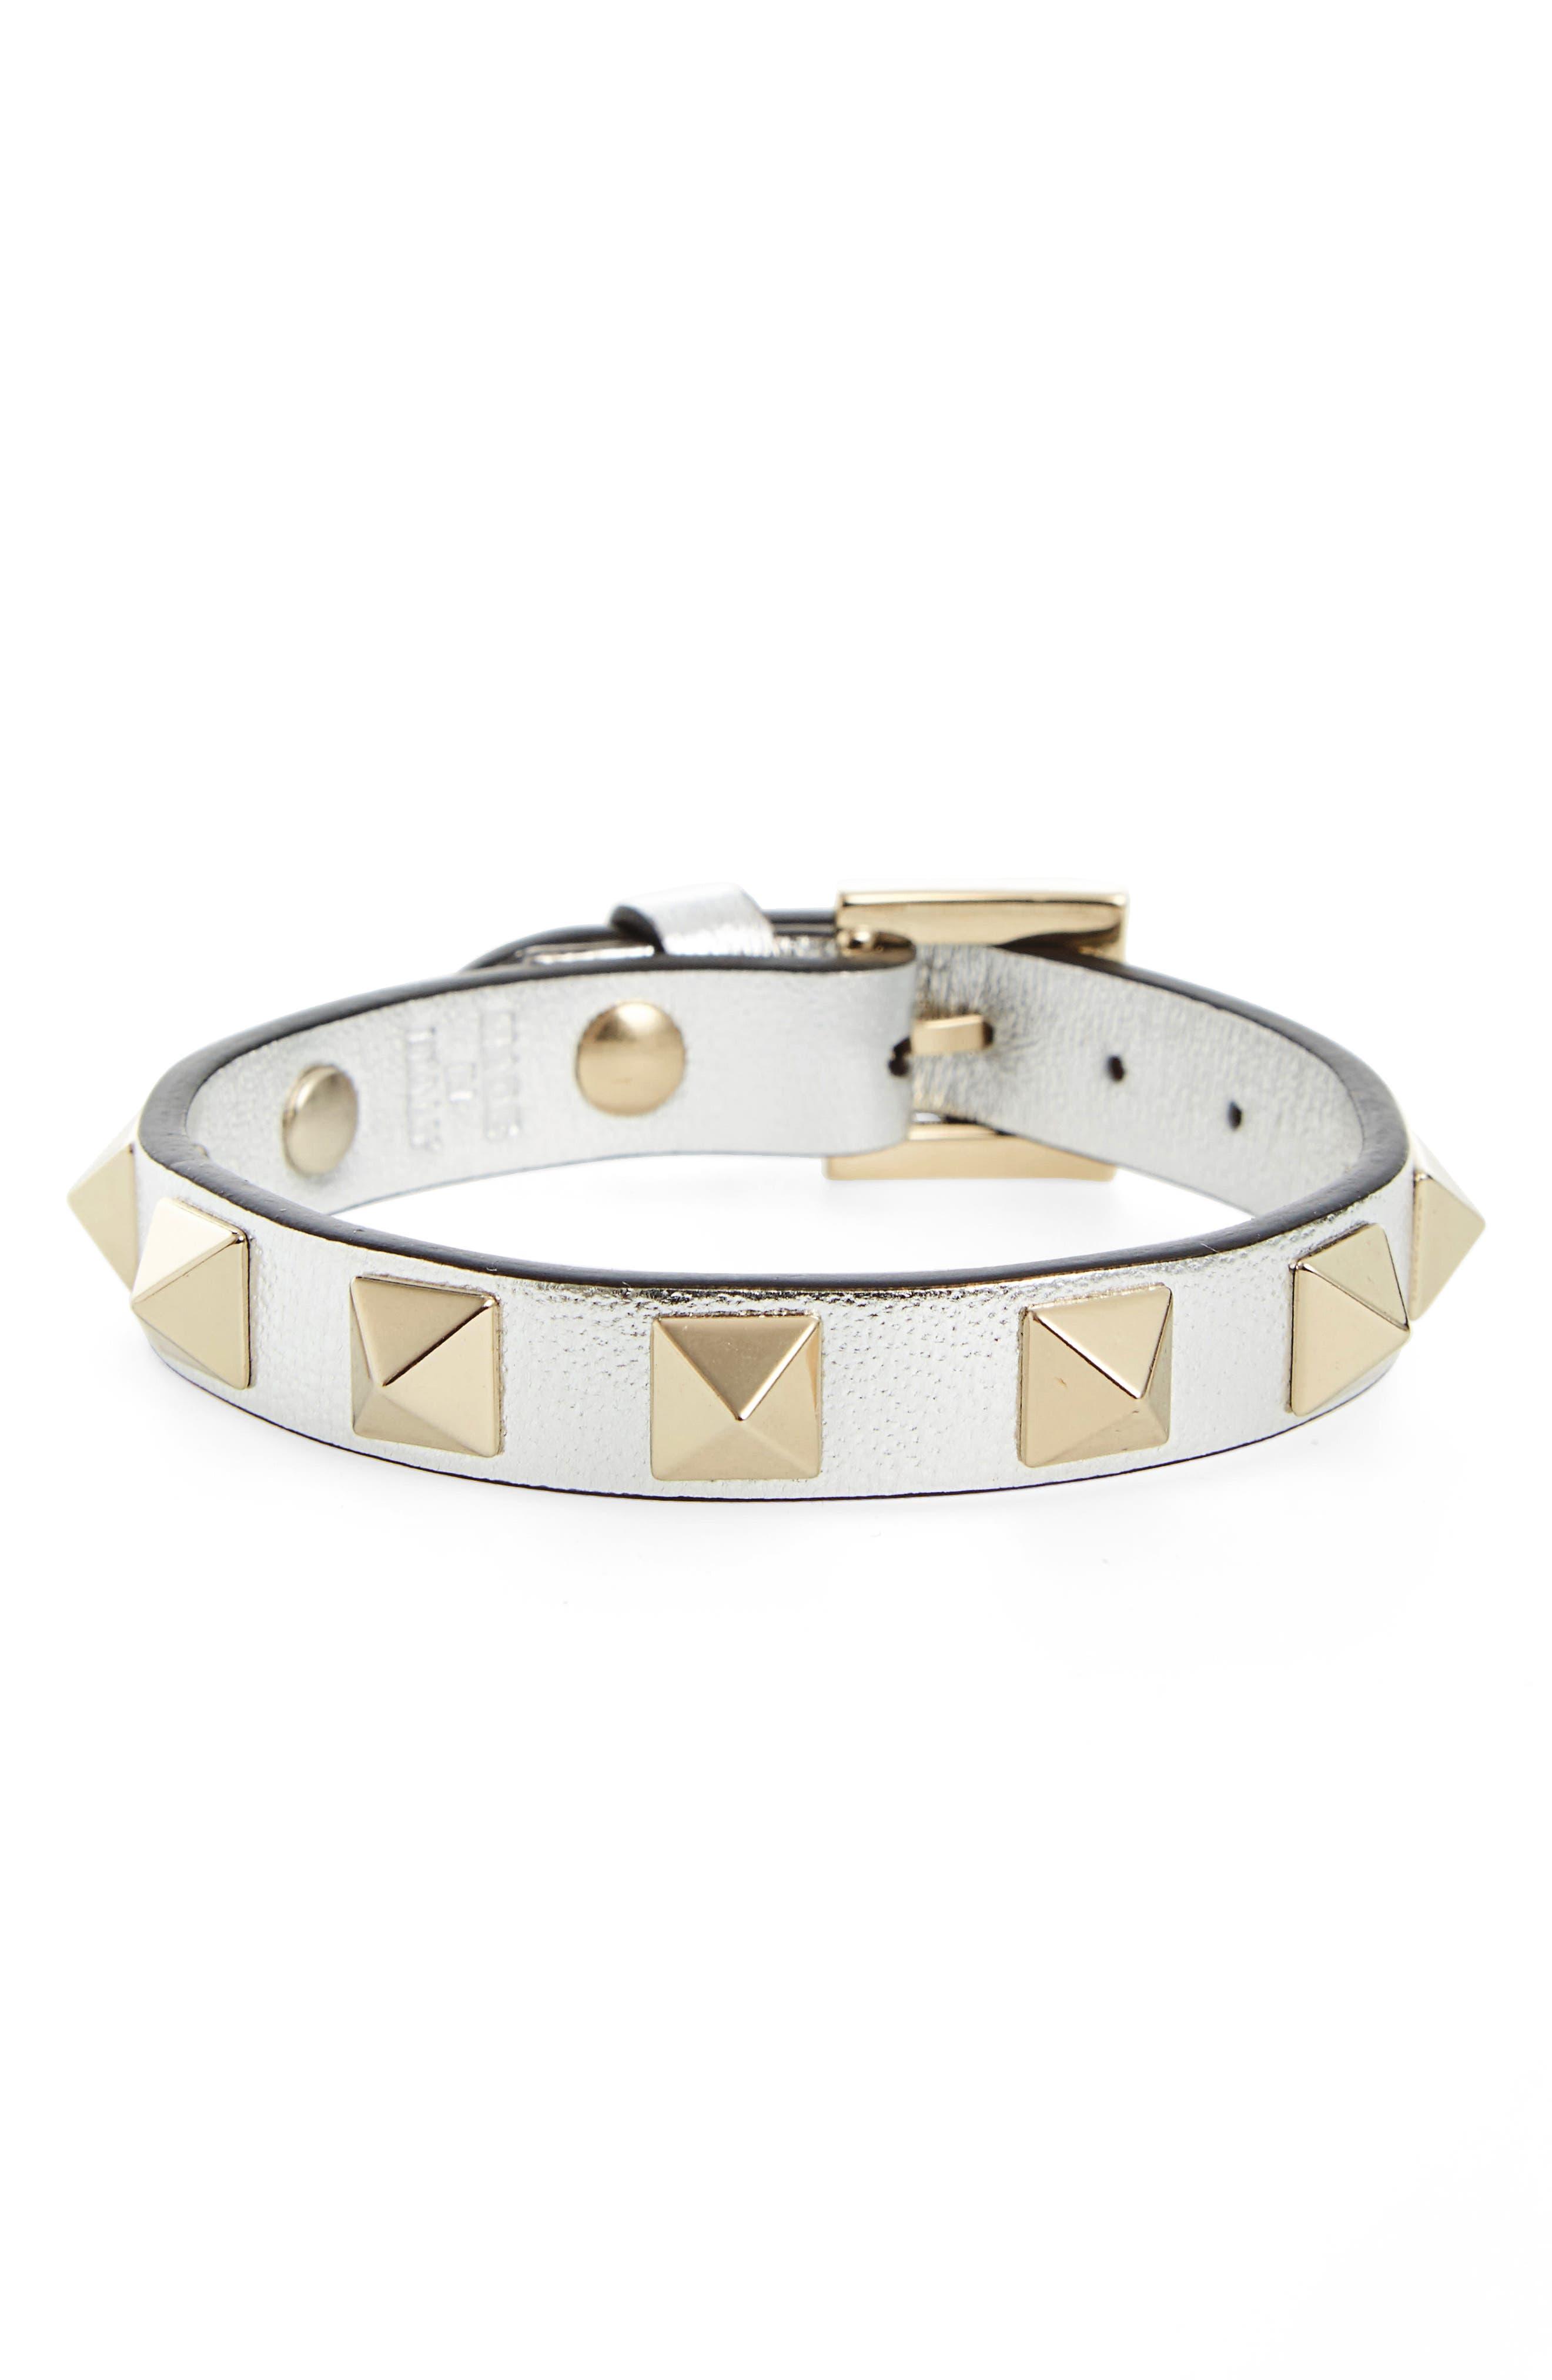 Main Image - Valentino Rockstud Leather Bracelet